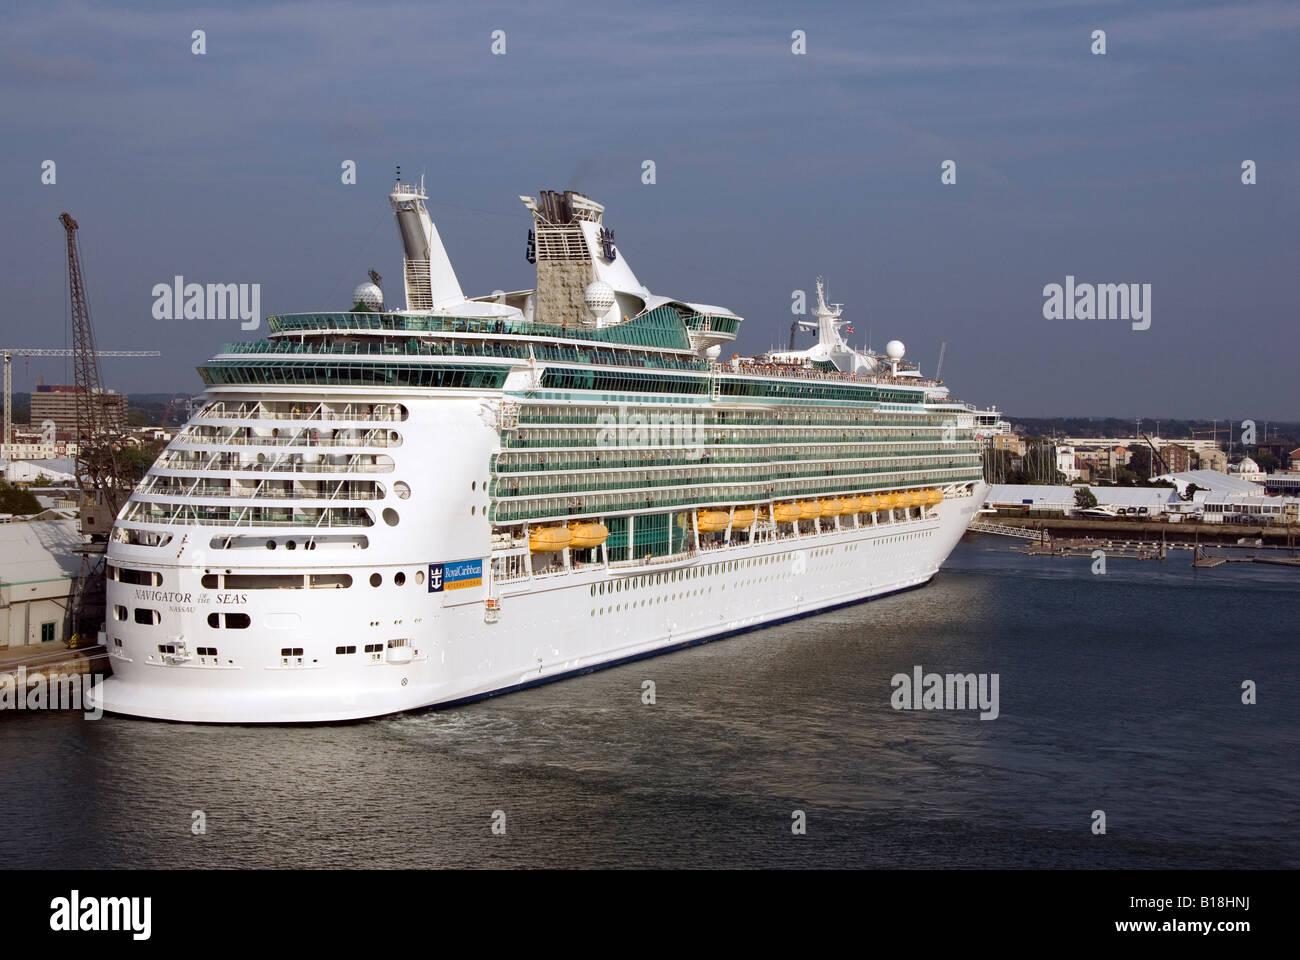 Royal Caribbean Cruise Liner Navigator of the Seas berthed at Southampton - Stock Image